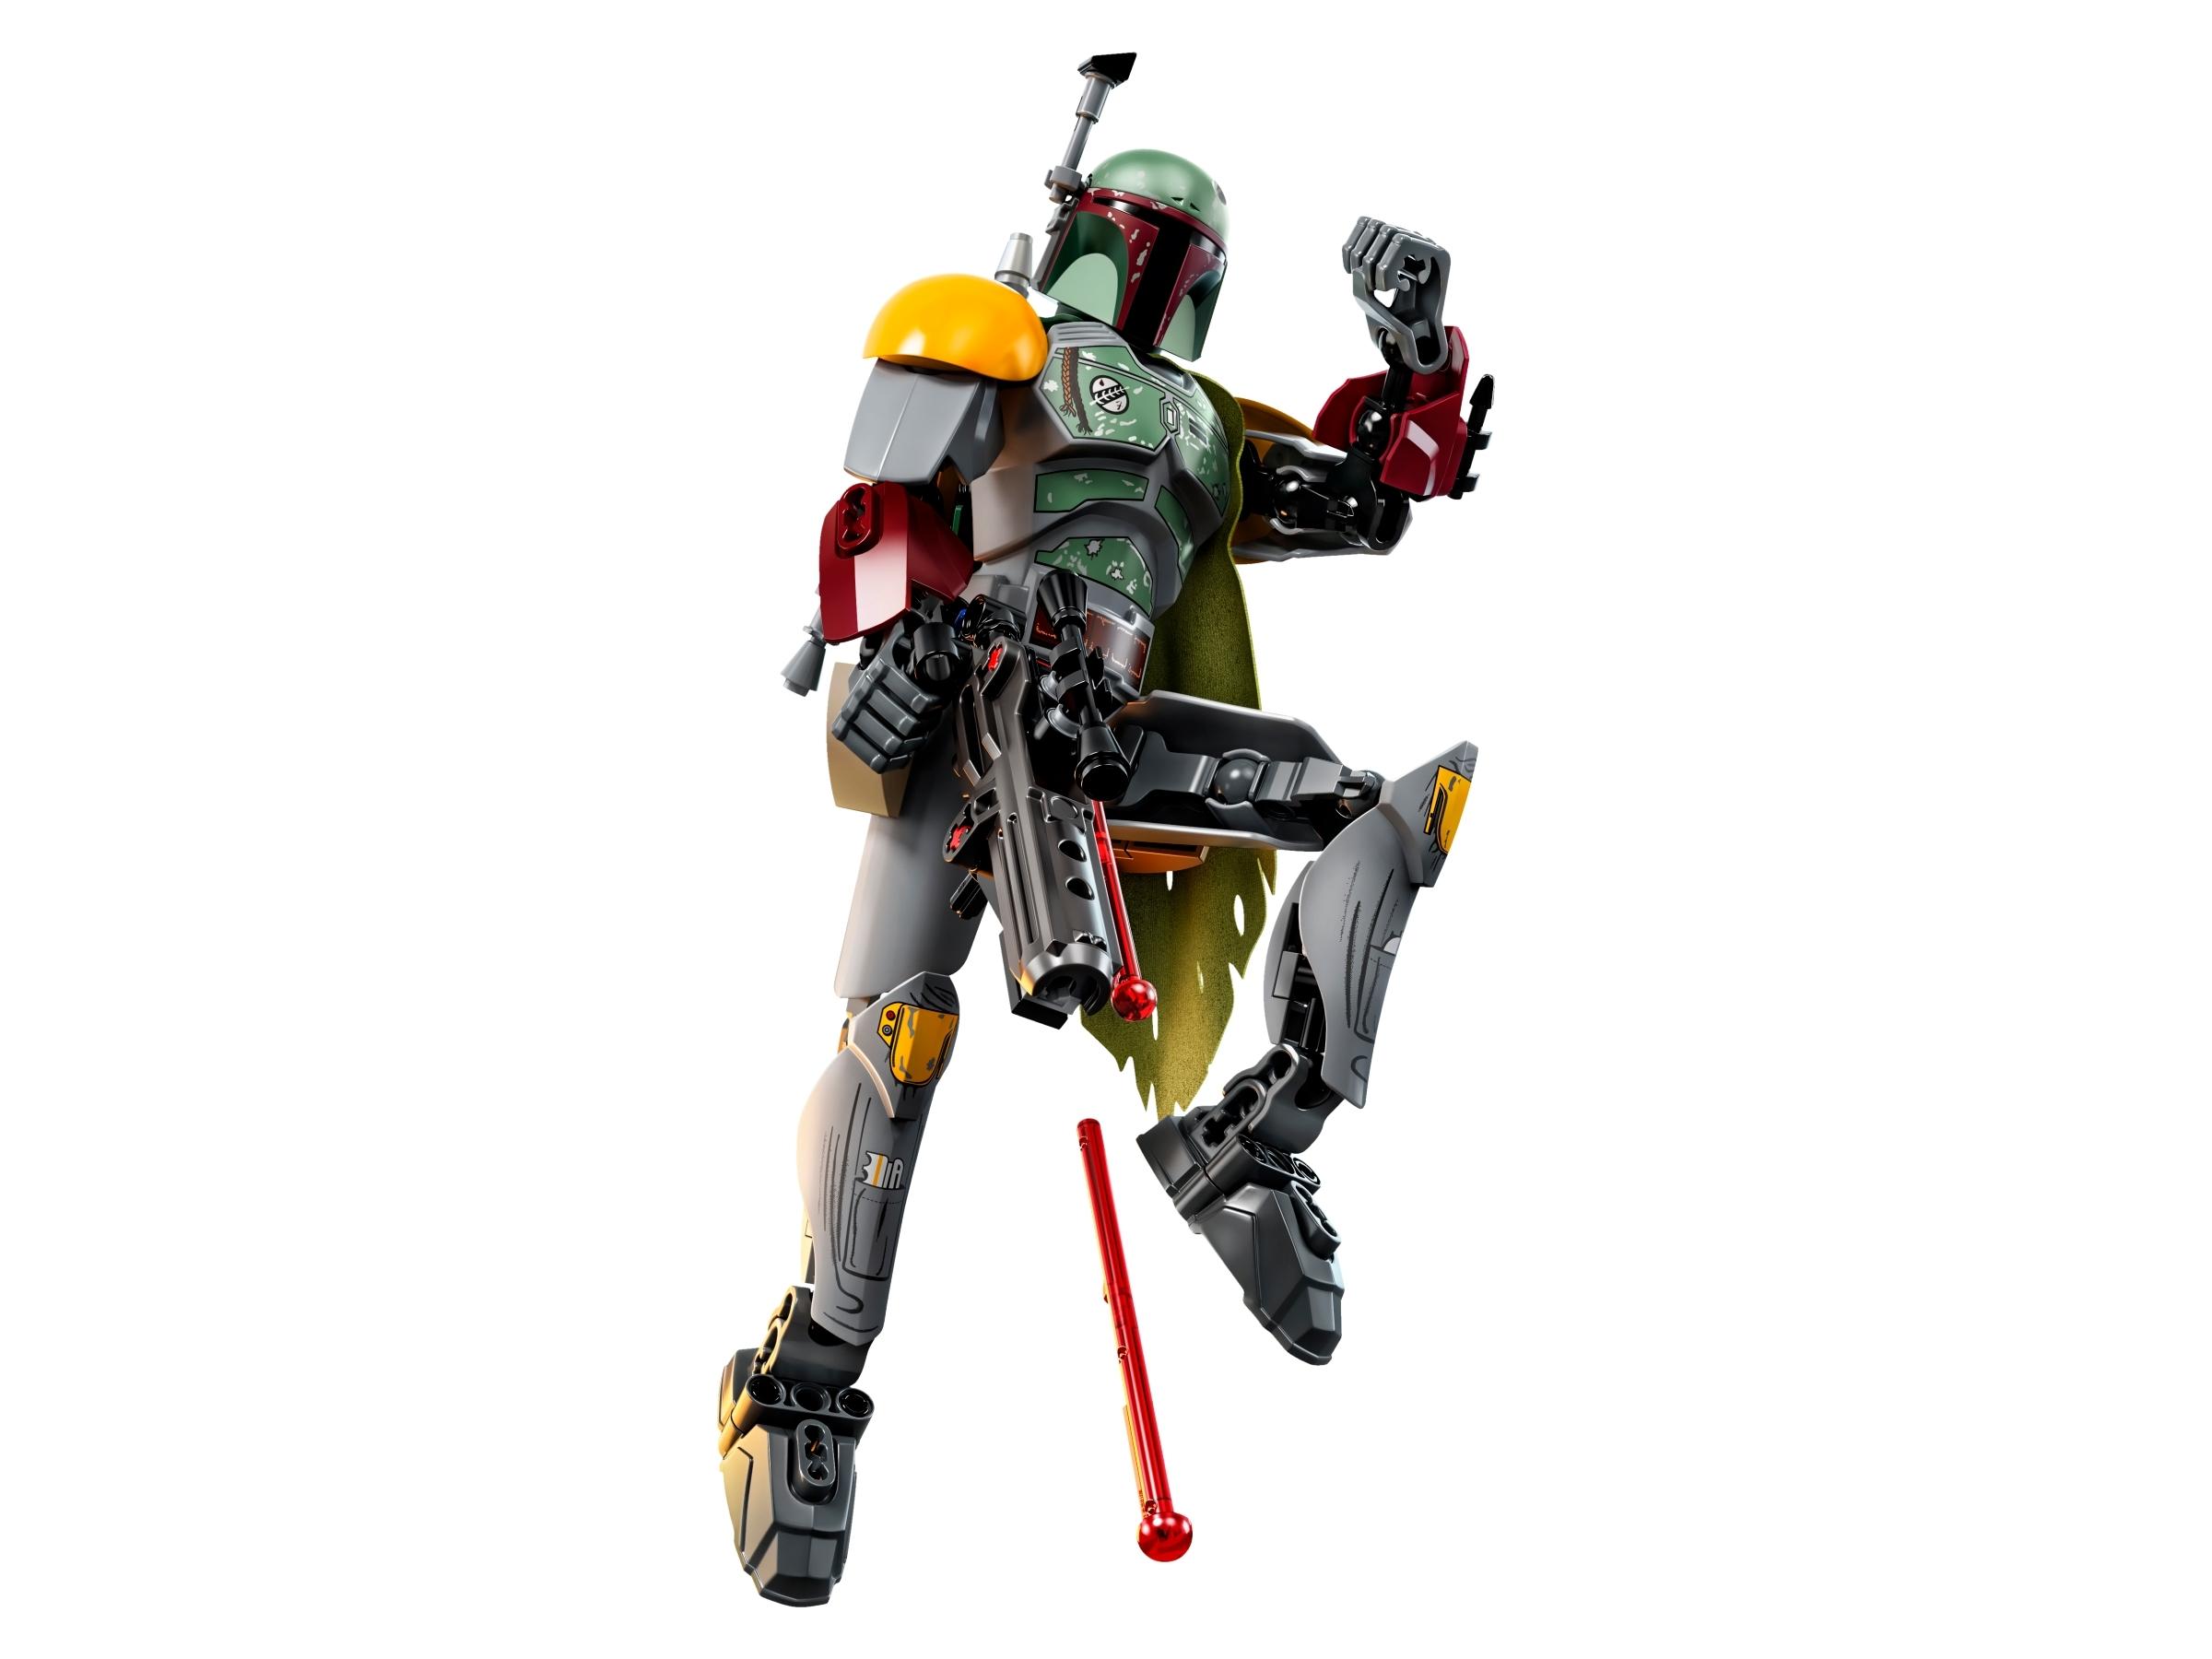 NUEVO Lego 75533 Boba Fett Star Wars Constraction